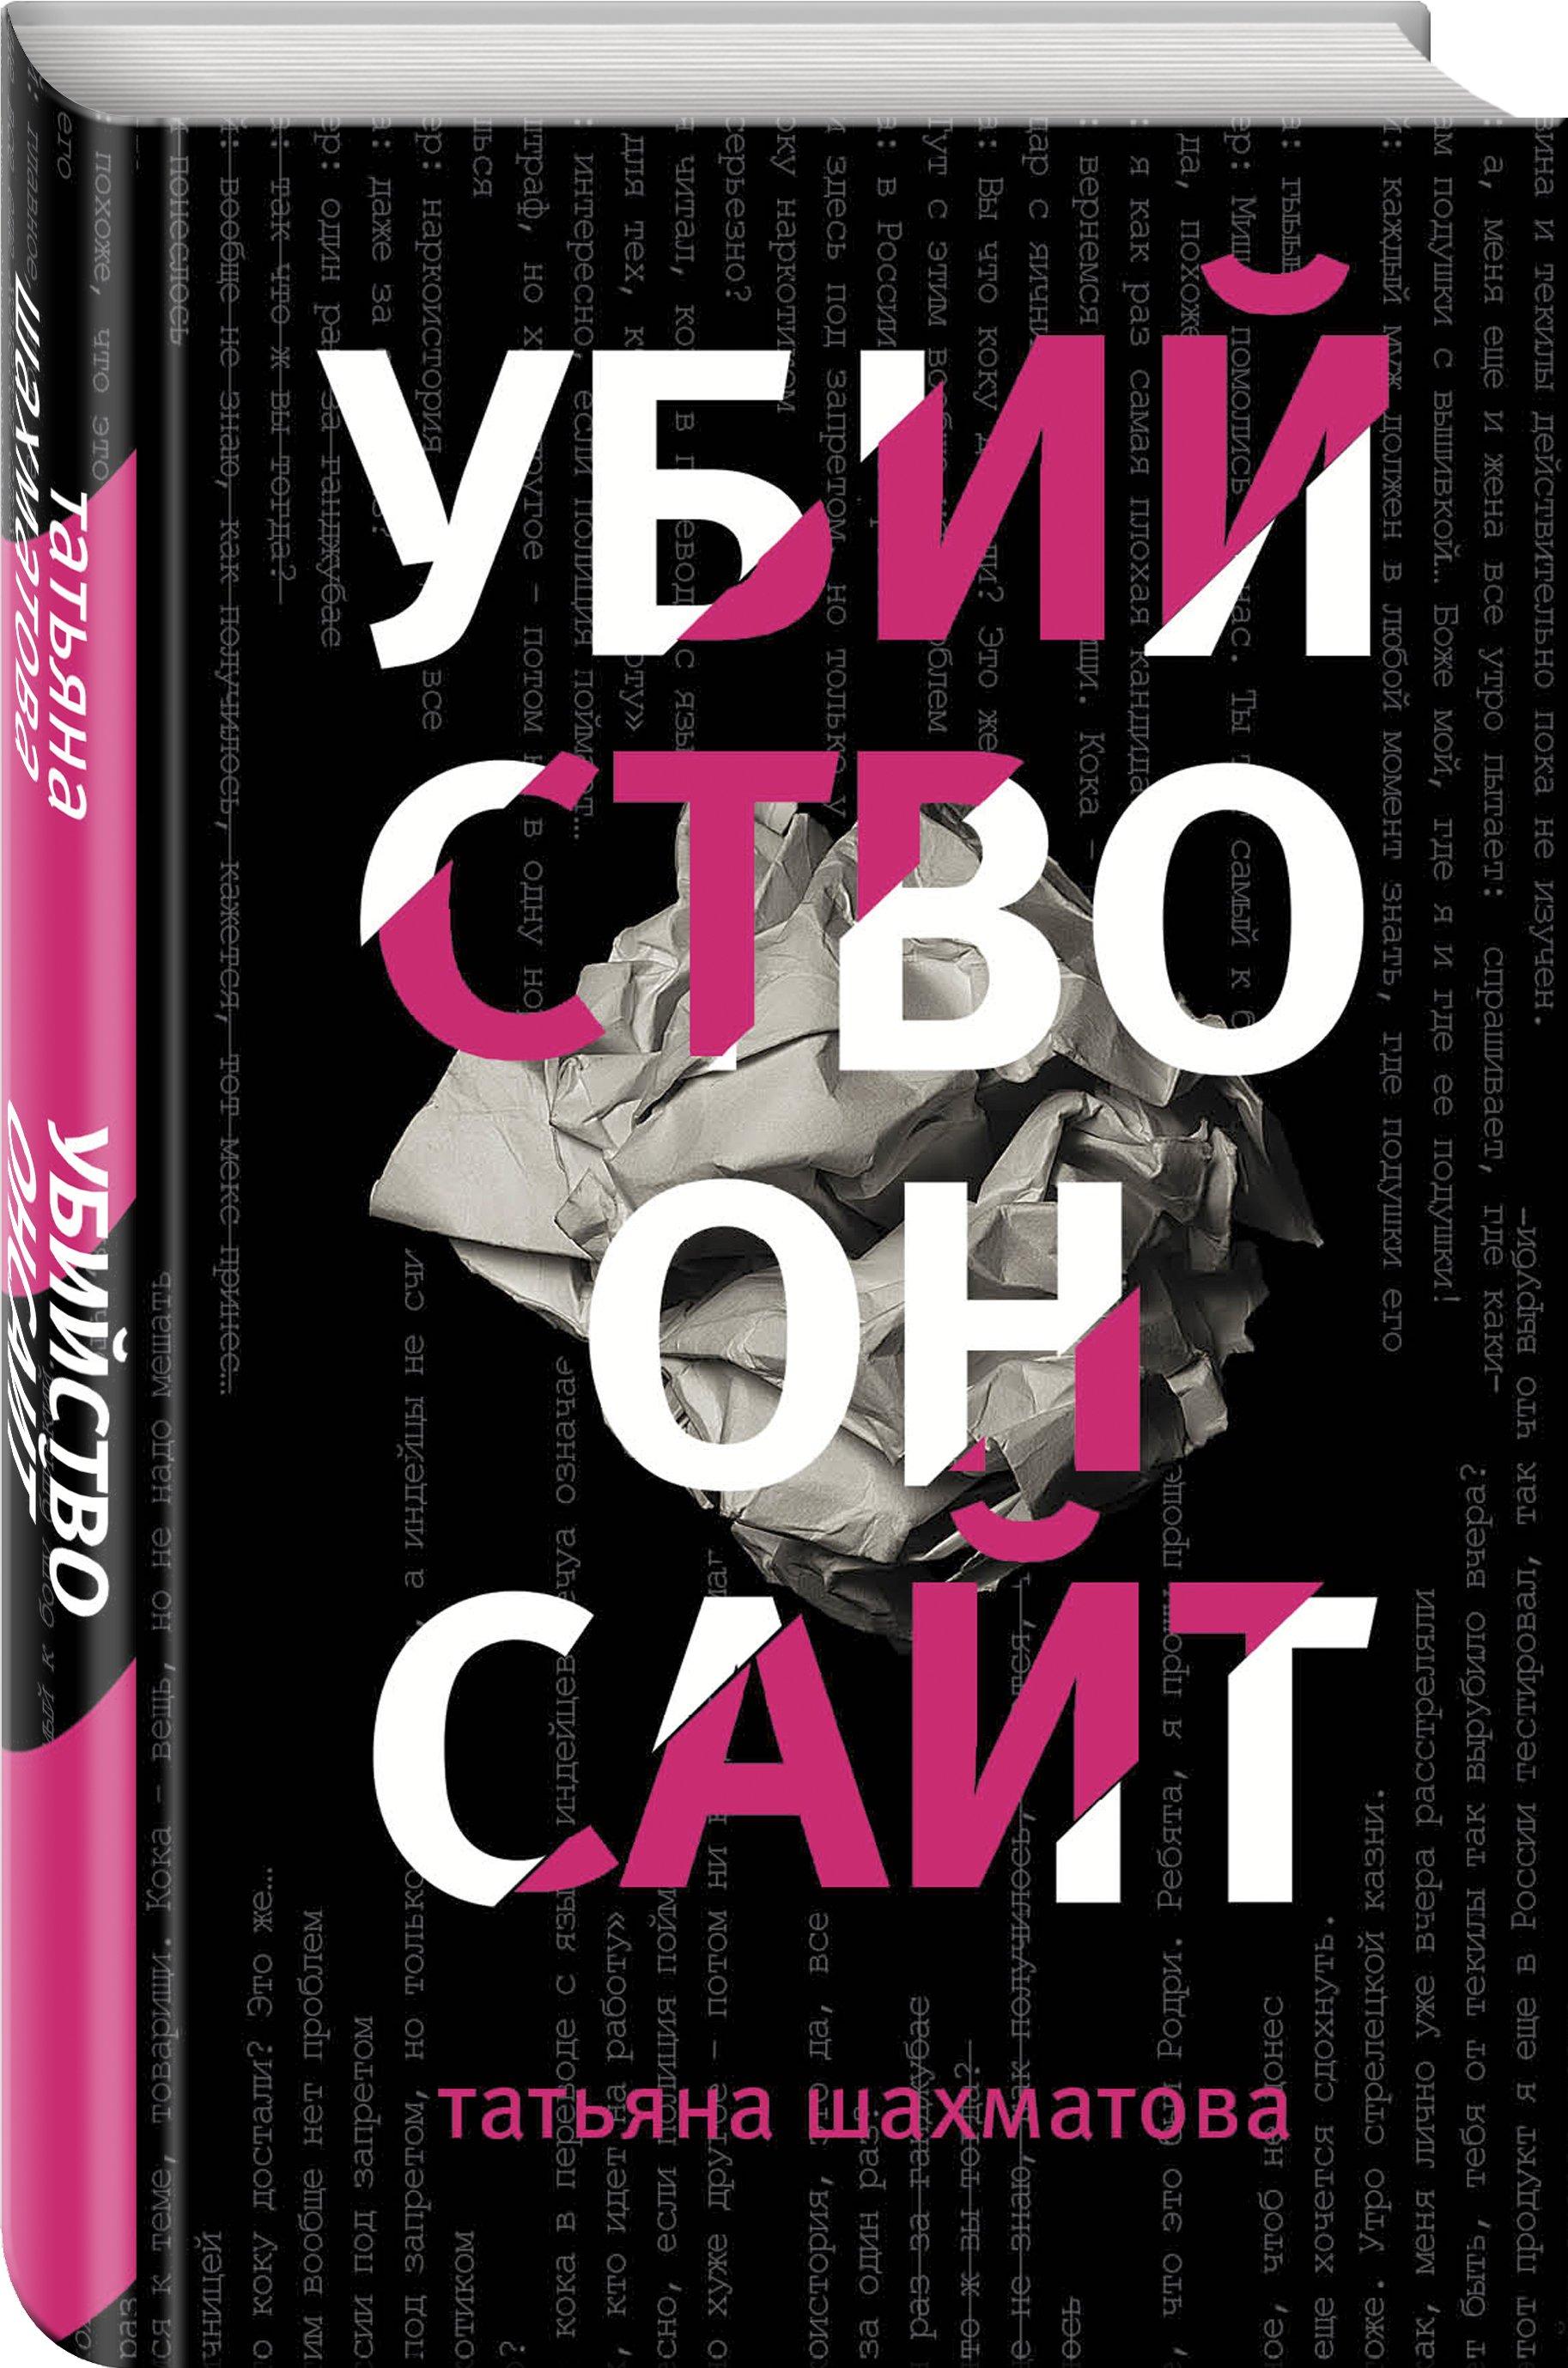 Шахматова Татьяна Сергеевна Убийство онсайт